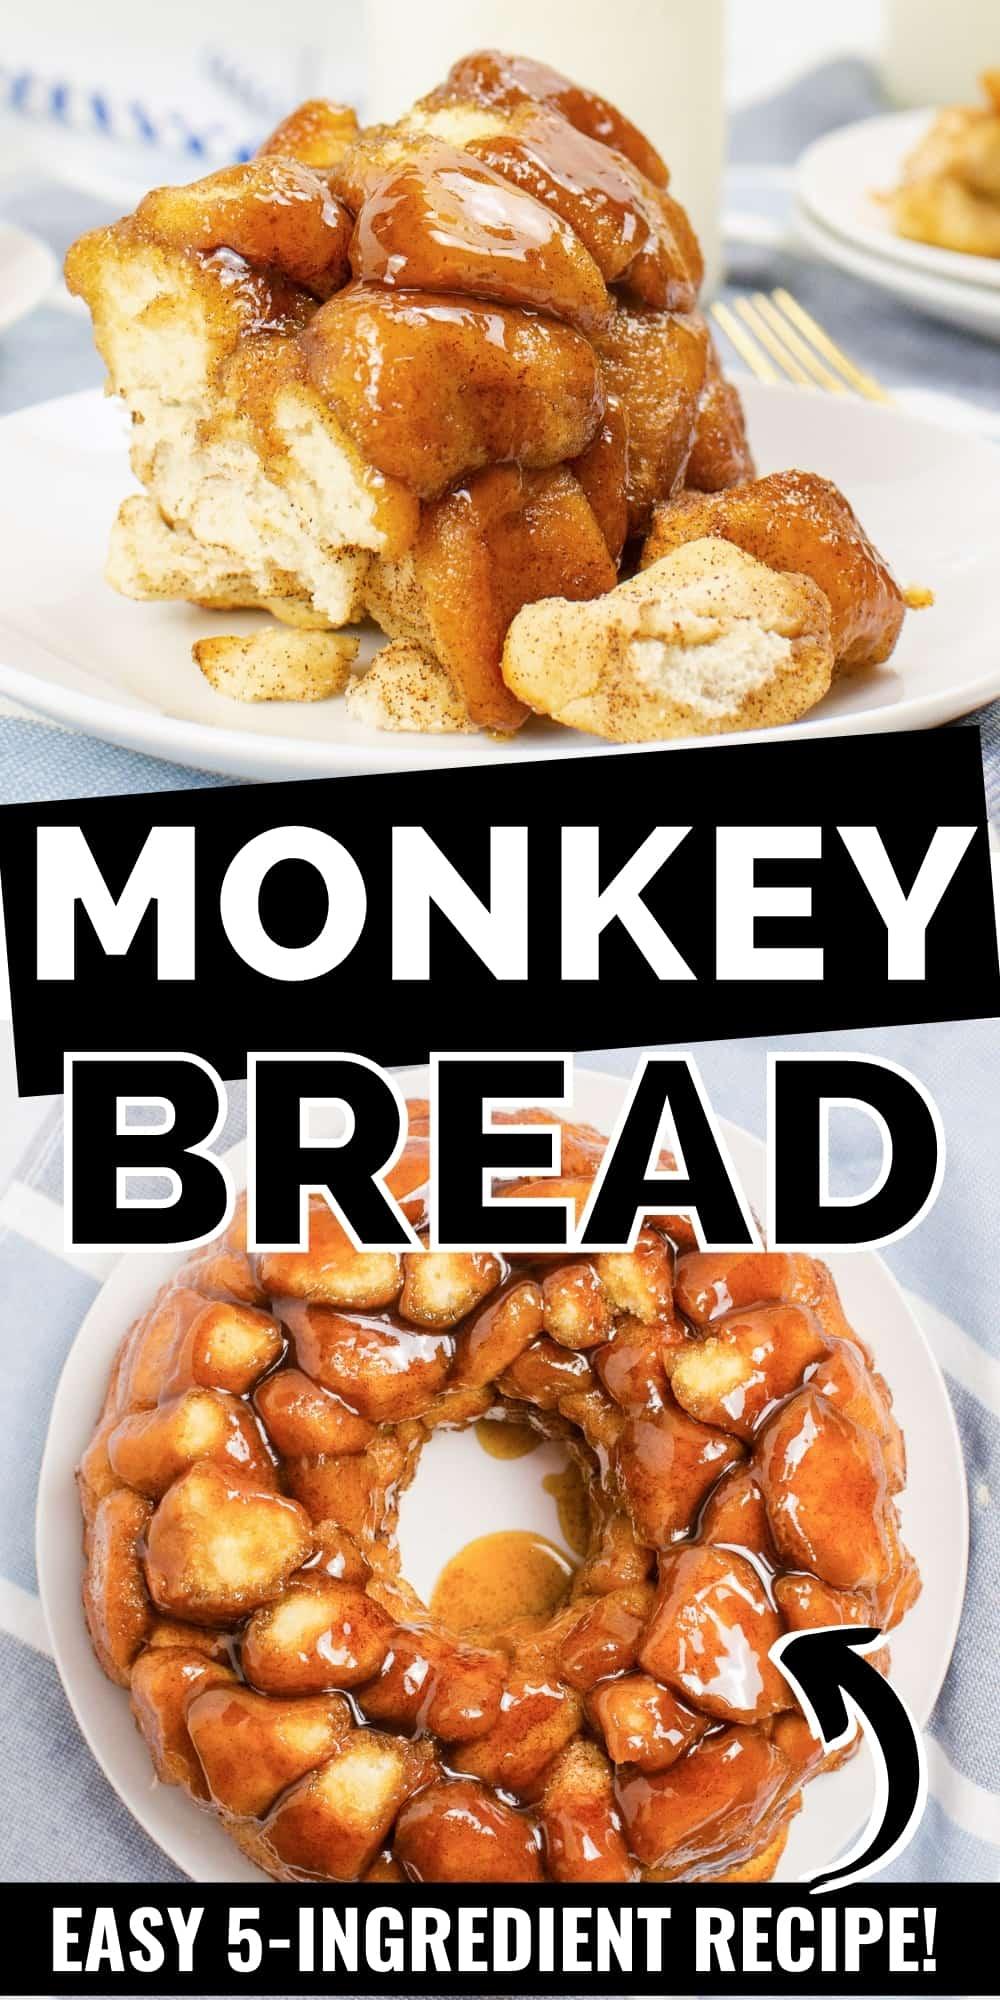 Pinterest Image, reads: Monkey Bread, easy 5 ingredient recipe